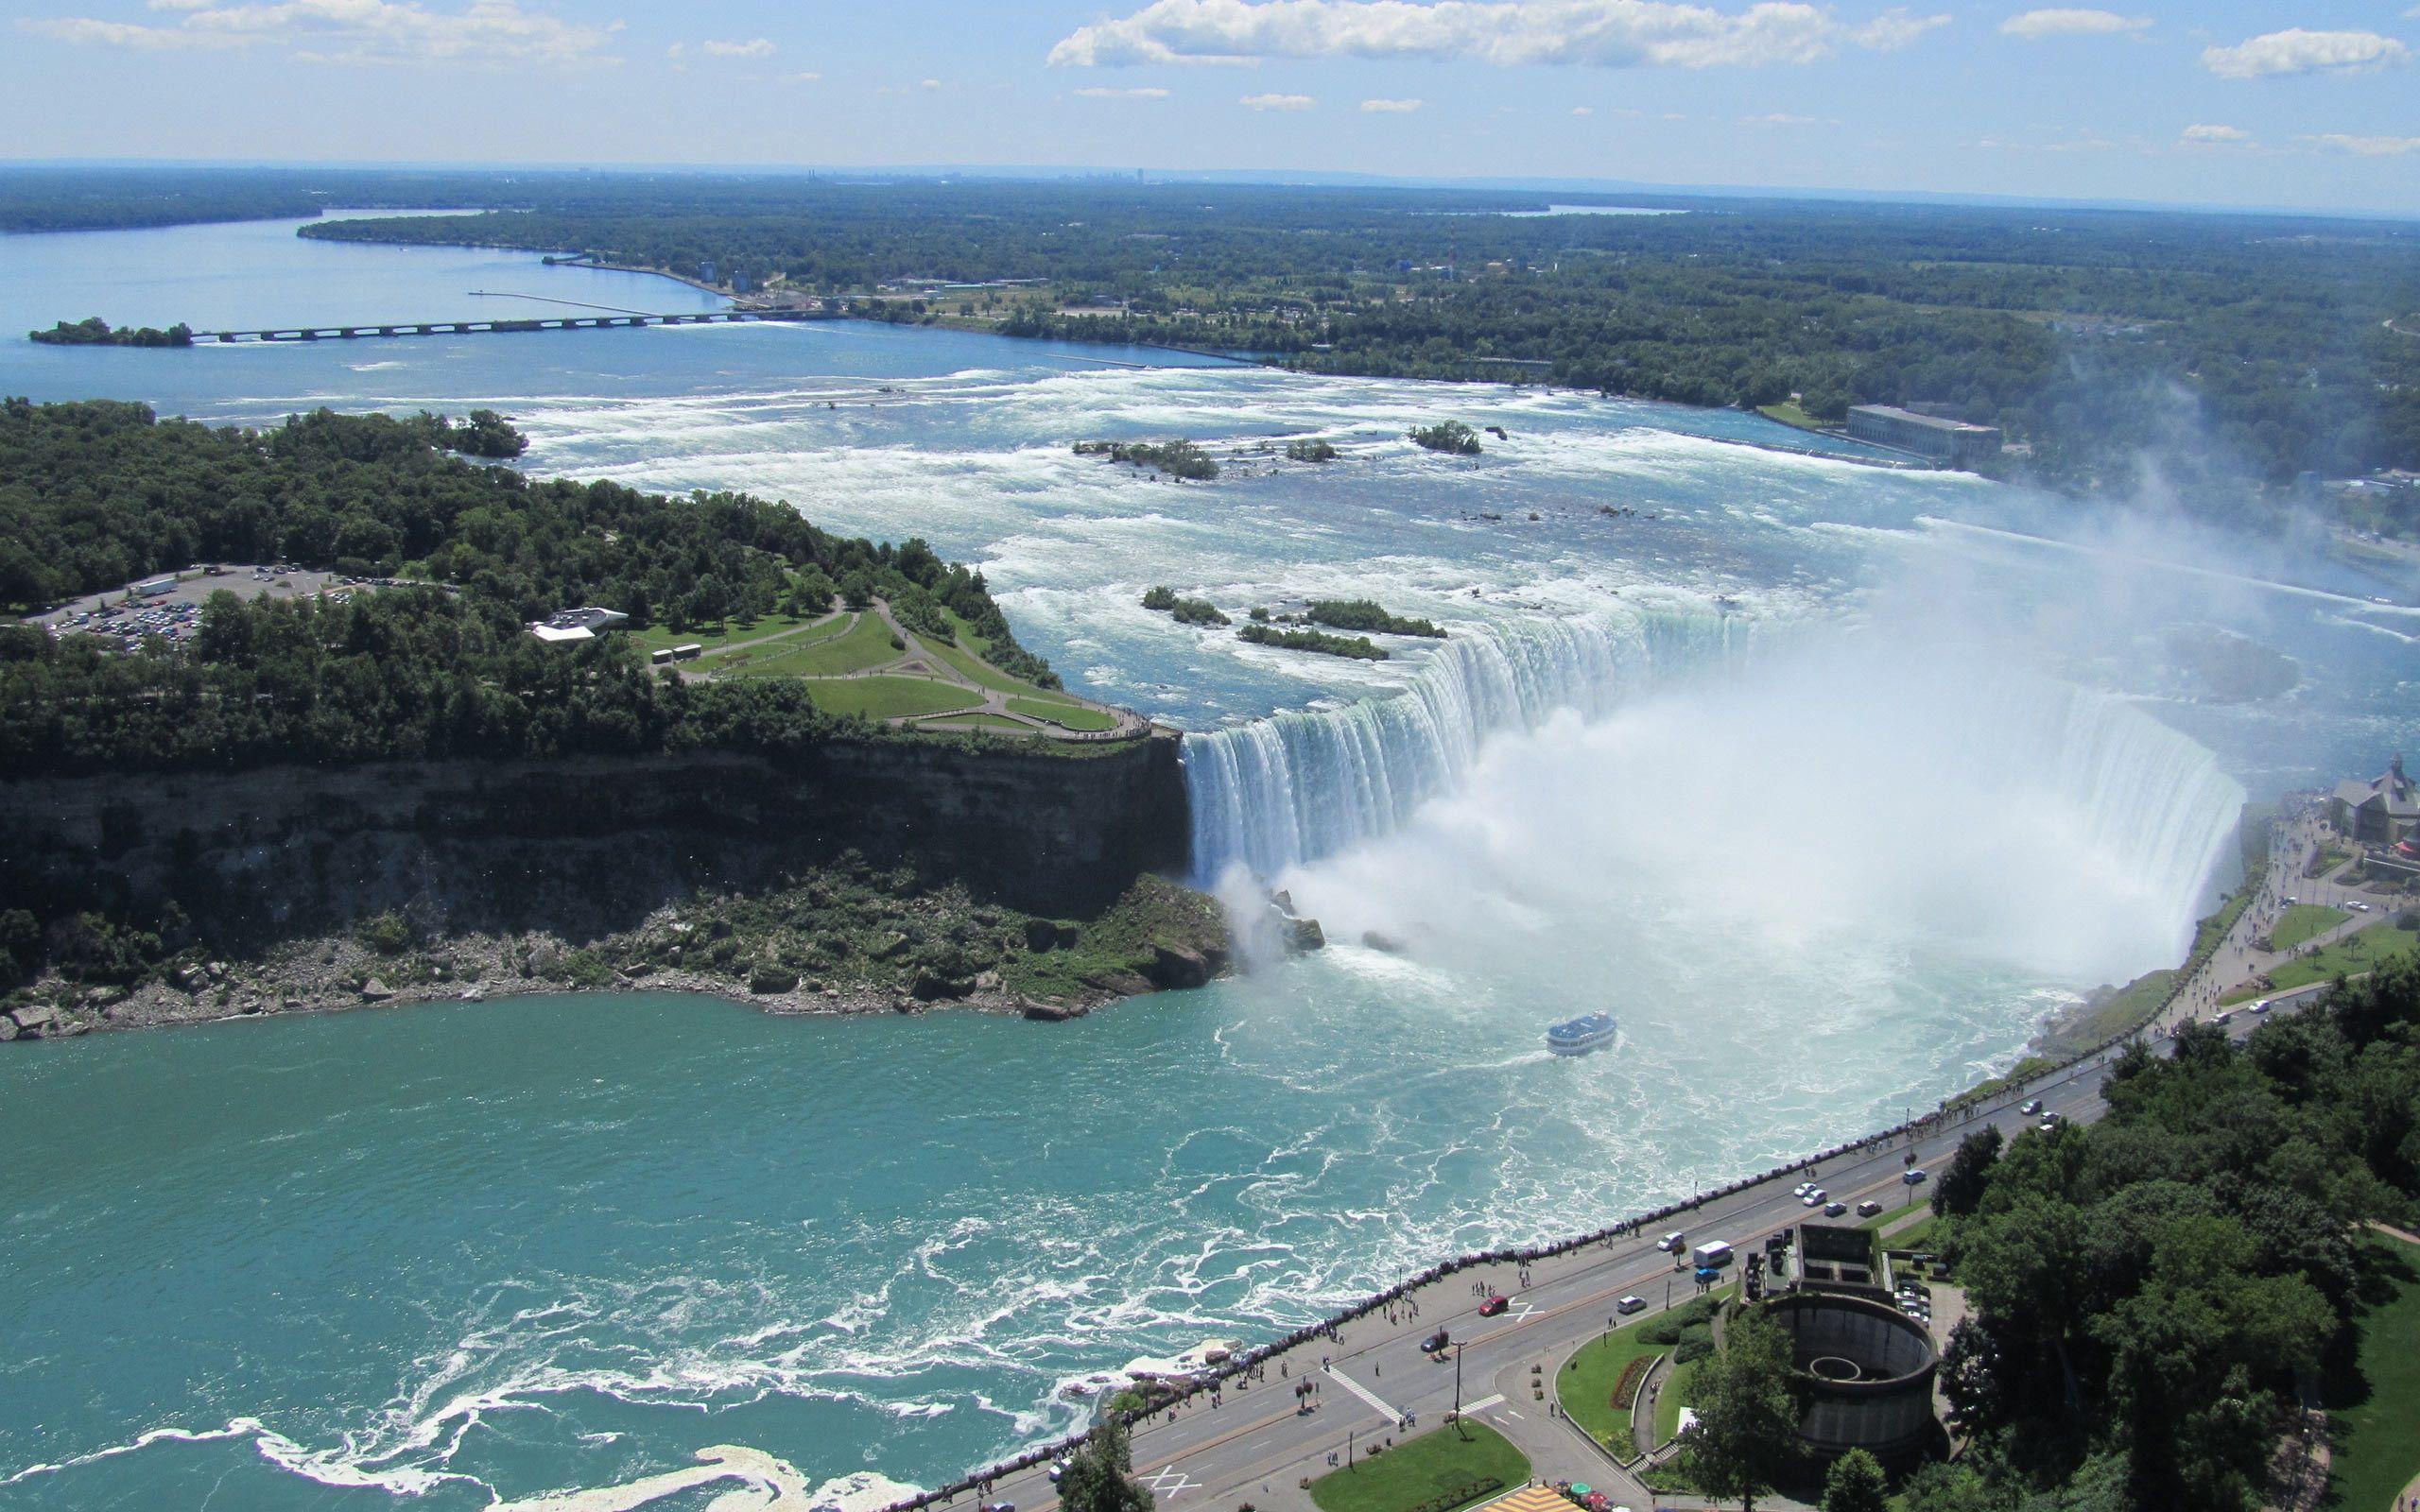 Ниагарский водопад картинка движущаяся